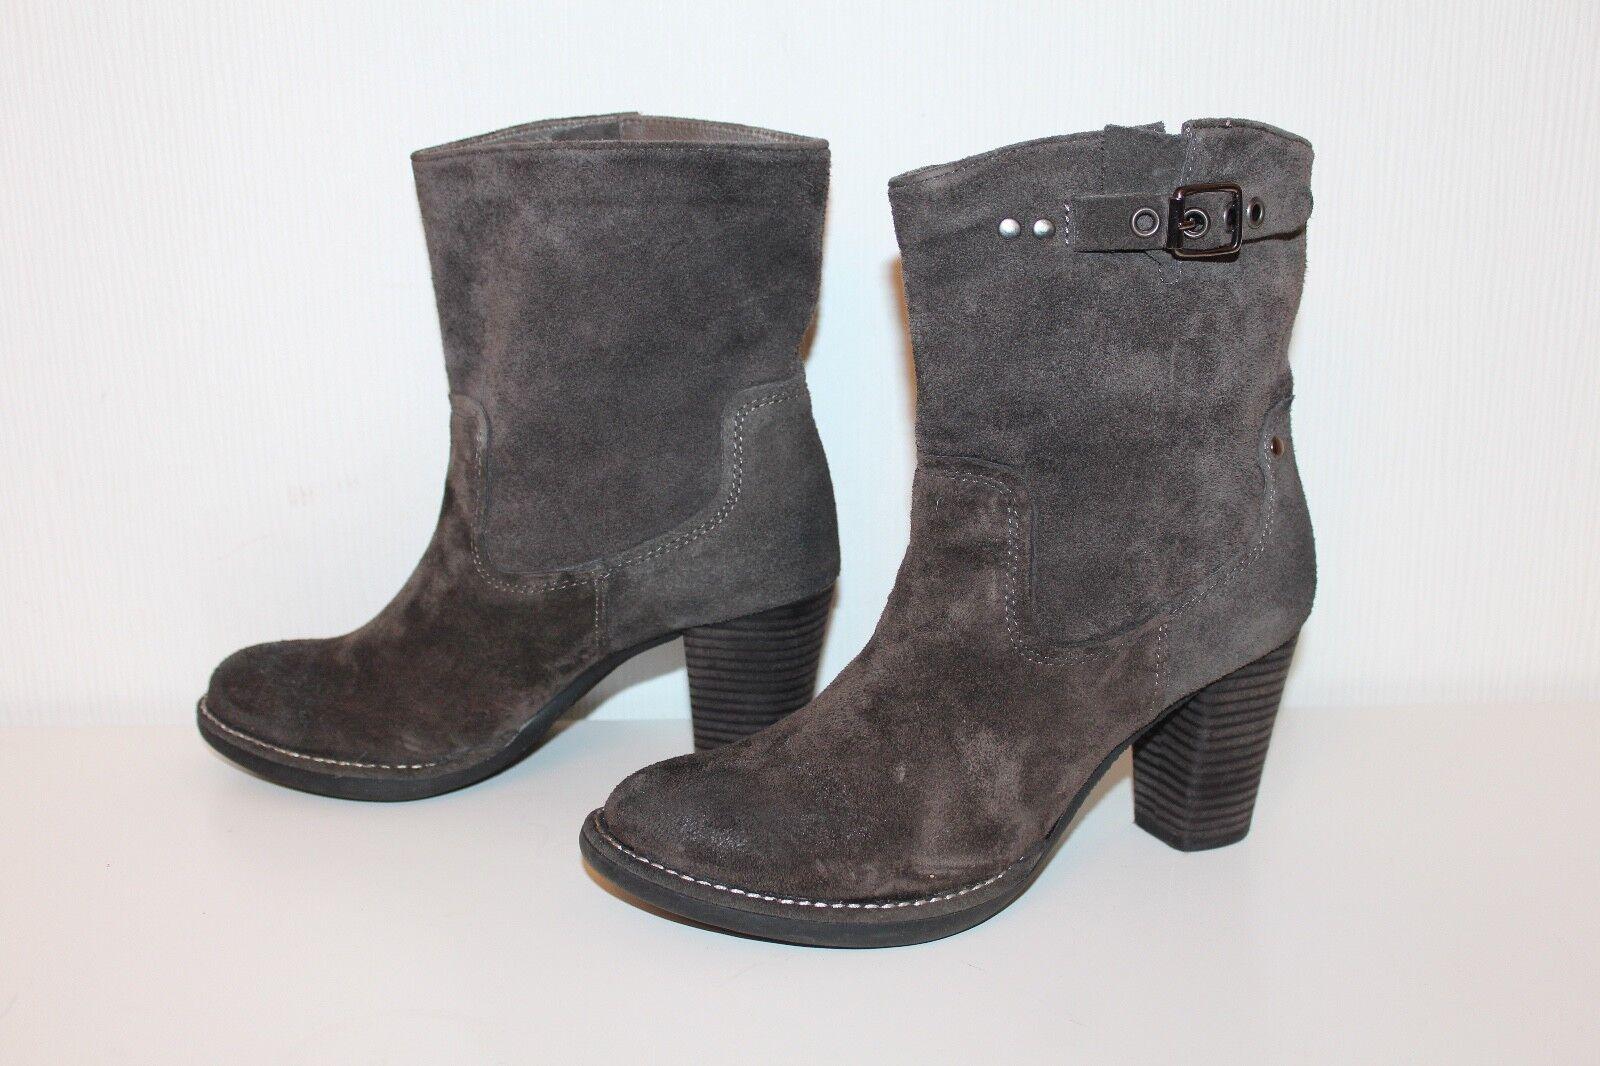 Zapatos botines casuales salvajes Liebeskind Berlin botines Zapatos zapatos 39 uk6 Echt Leder antelina 855319